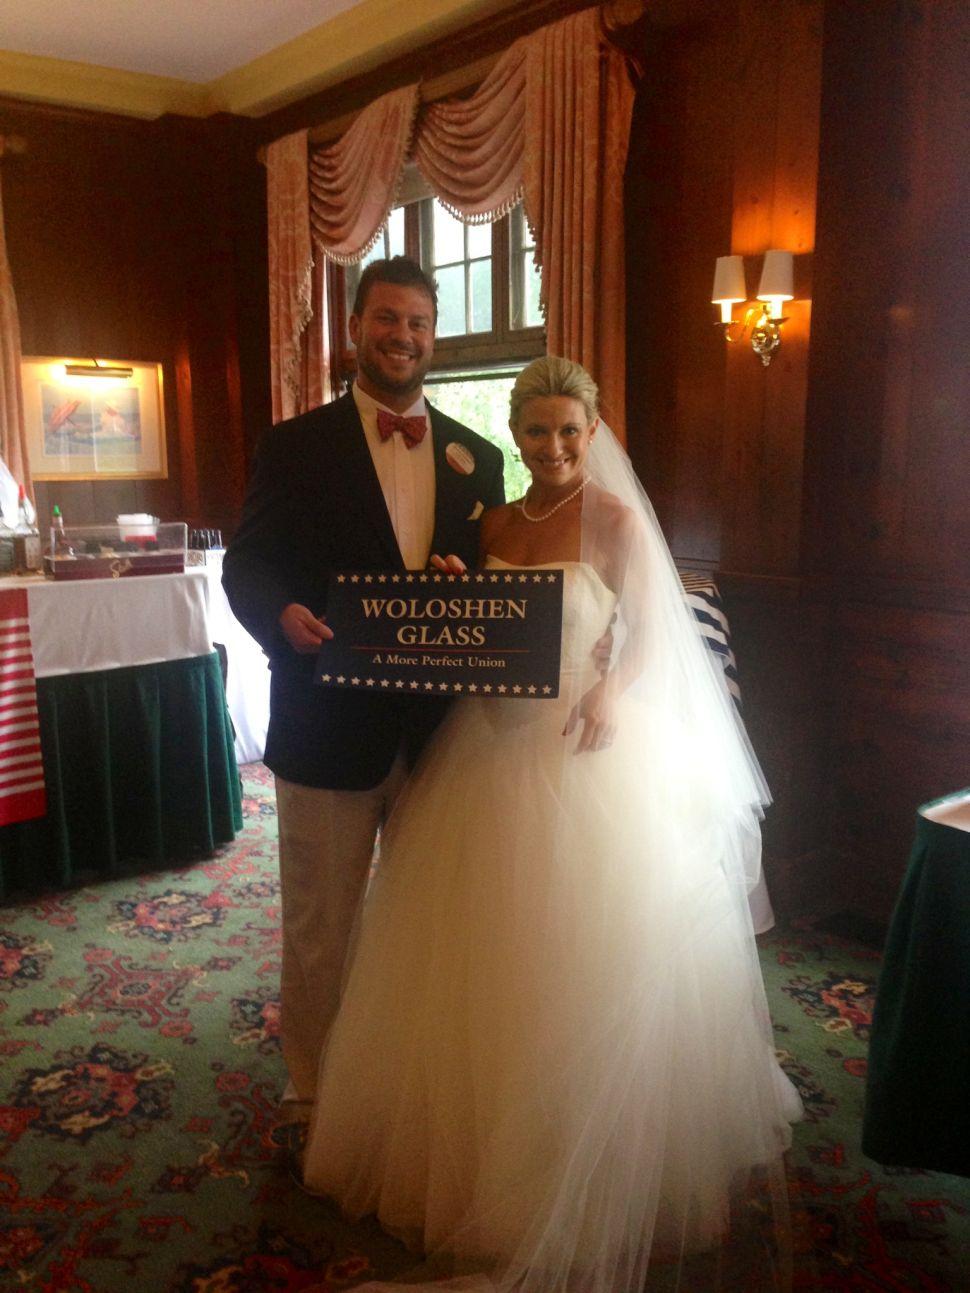 Congrats to Amanda Woloshen and Dave Glass